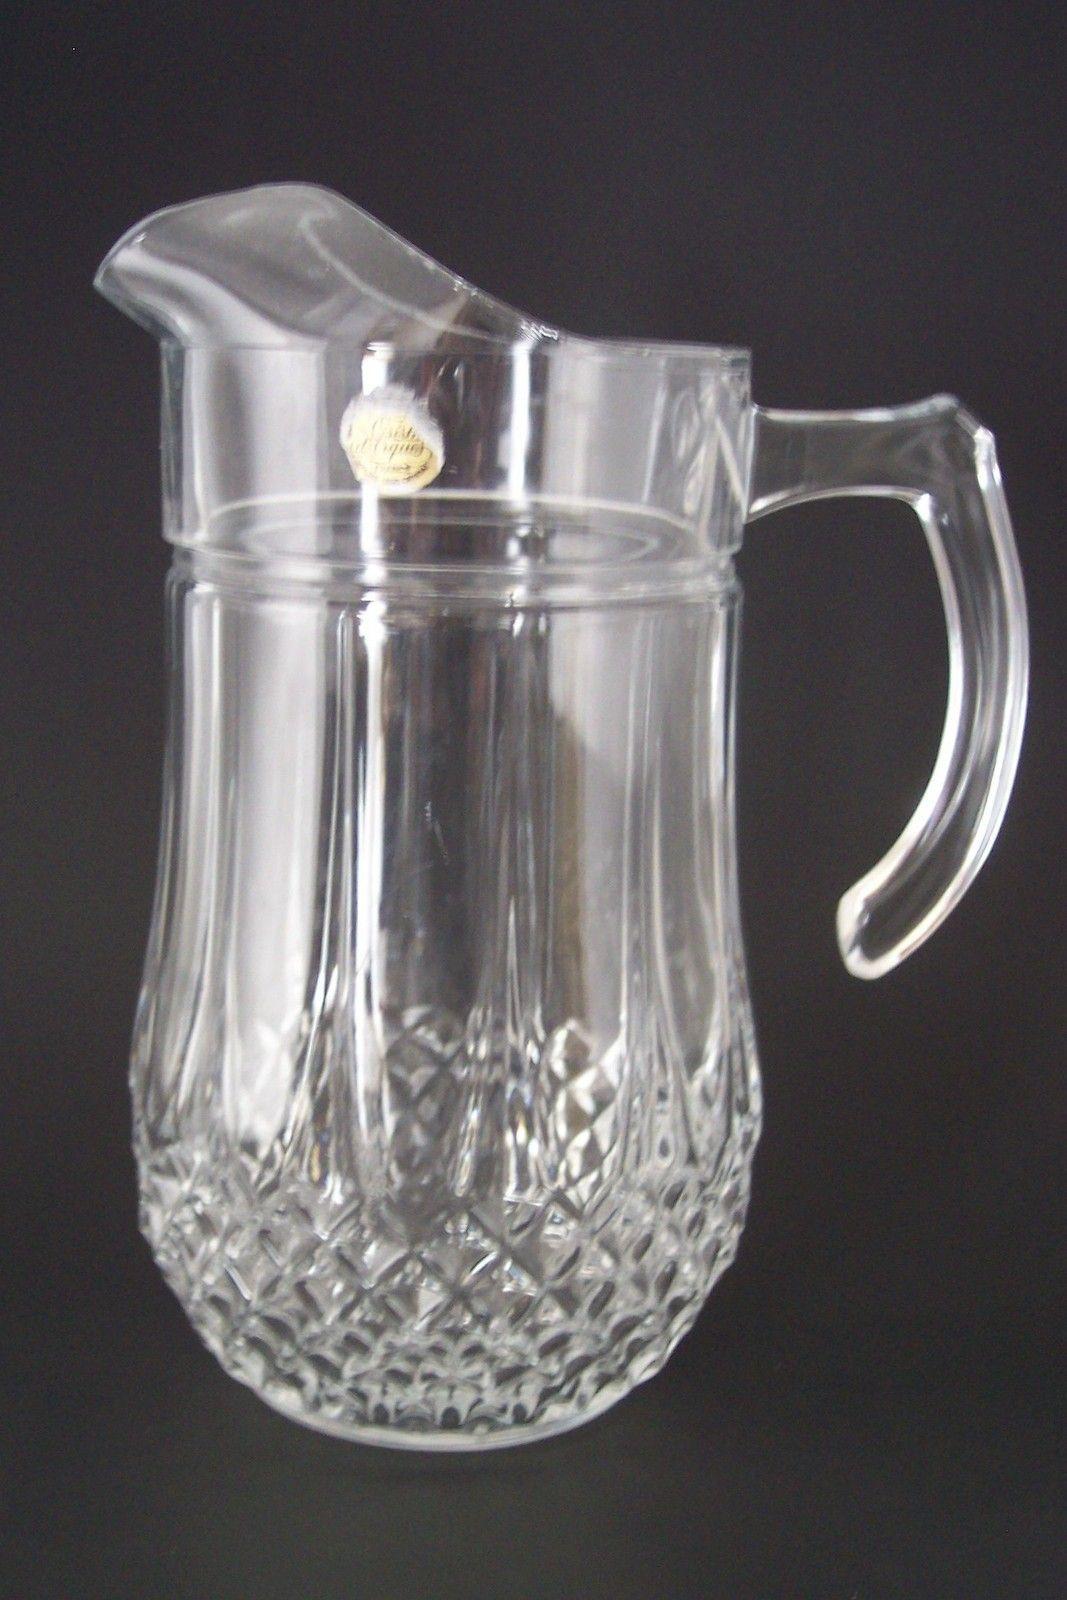 Cristal Darques France Genuine Lead Crystal Vase.19 Awesome Cristal D Arques Vase France Decorative Vase Ideas